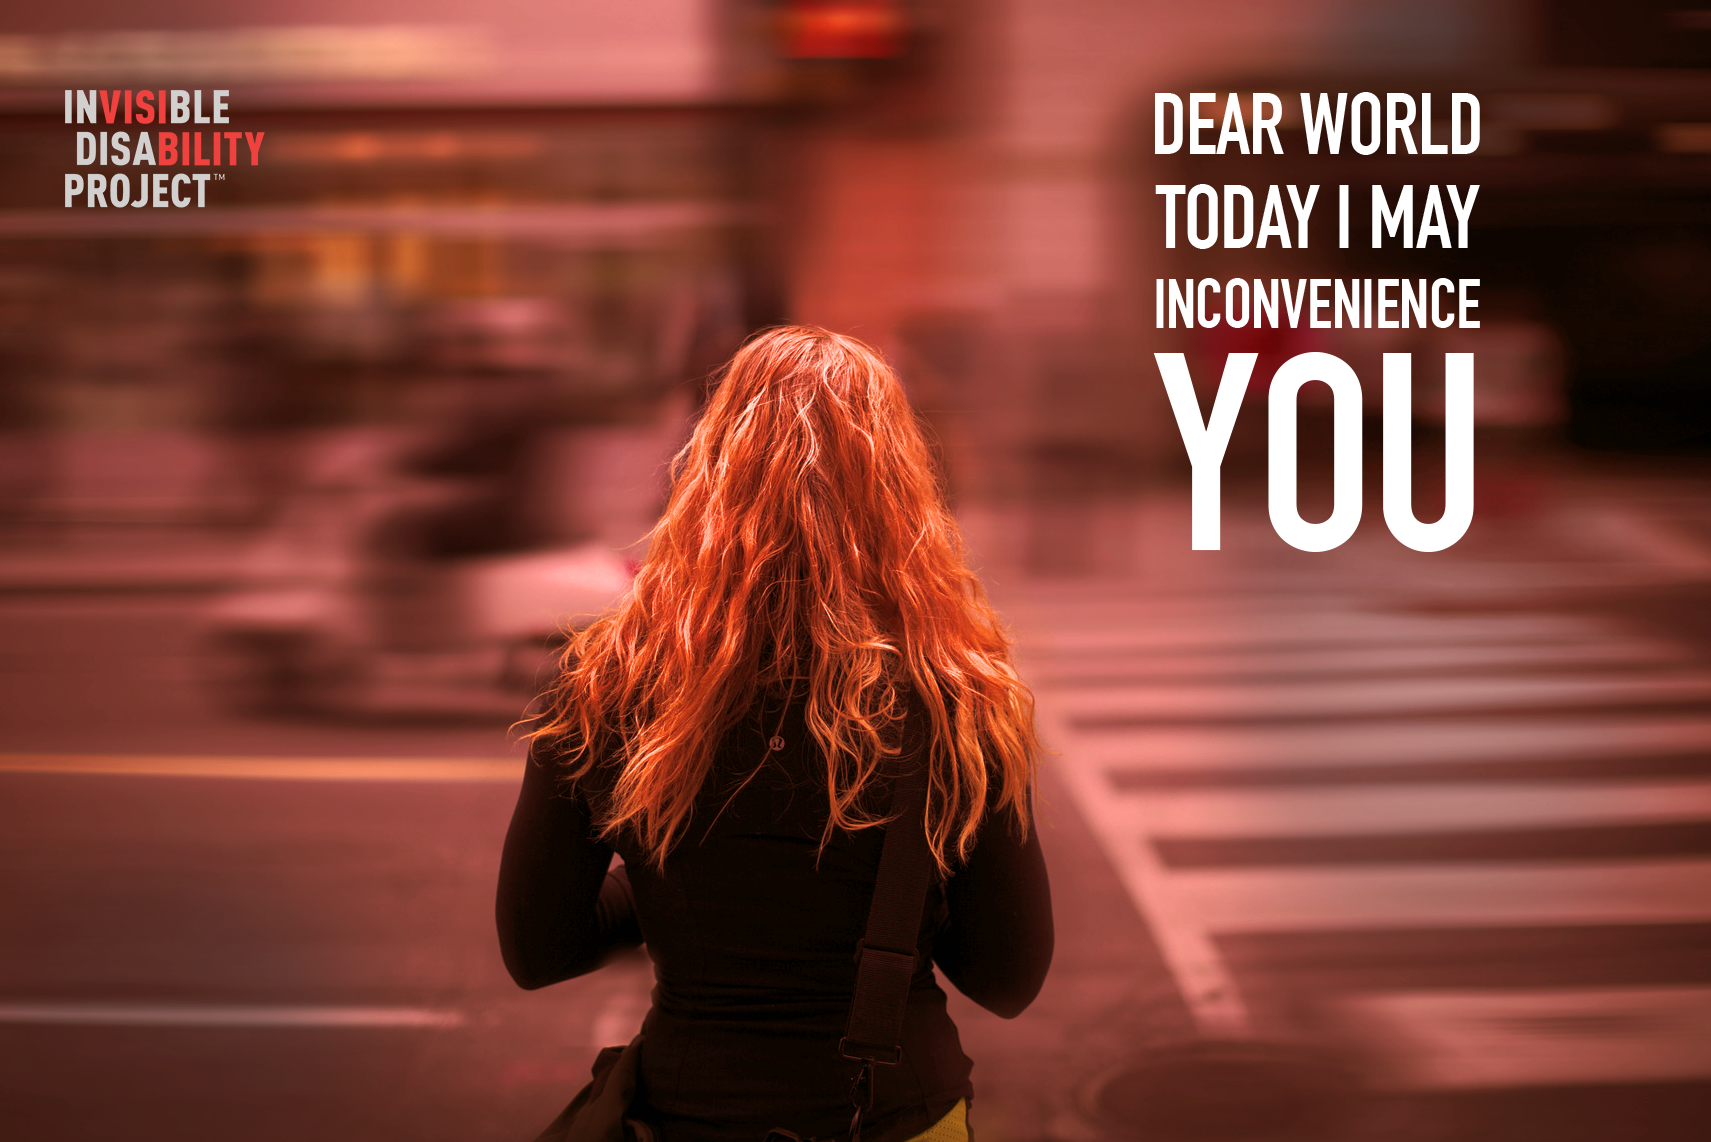 Dear World, Today I May Inconvenience You